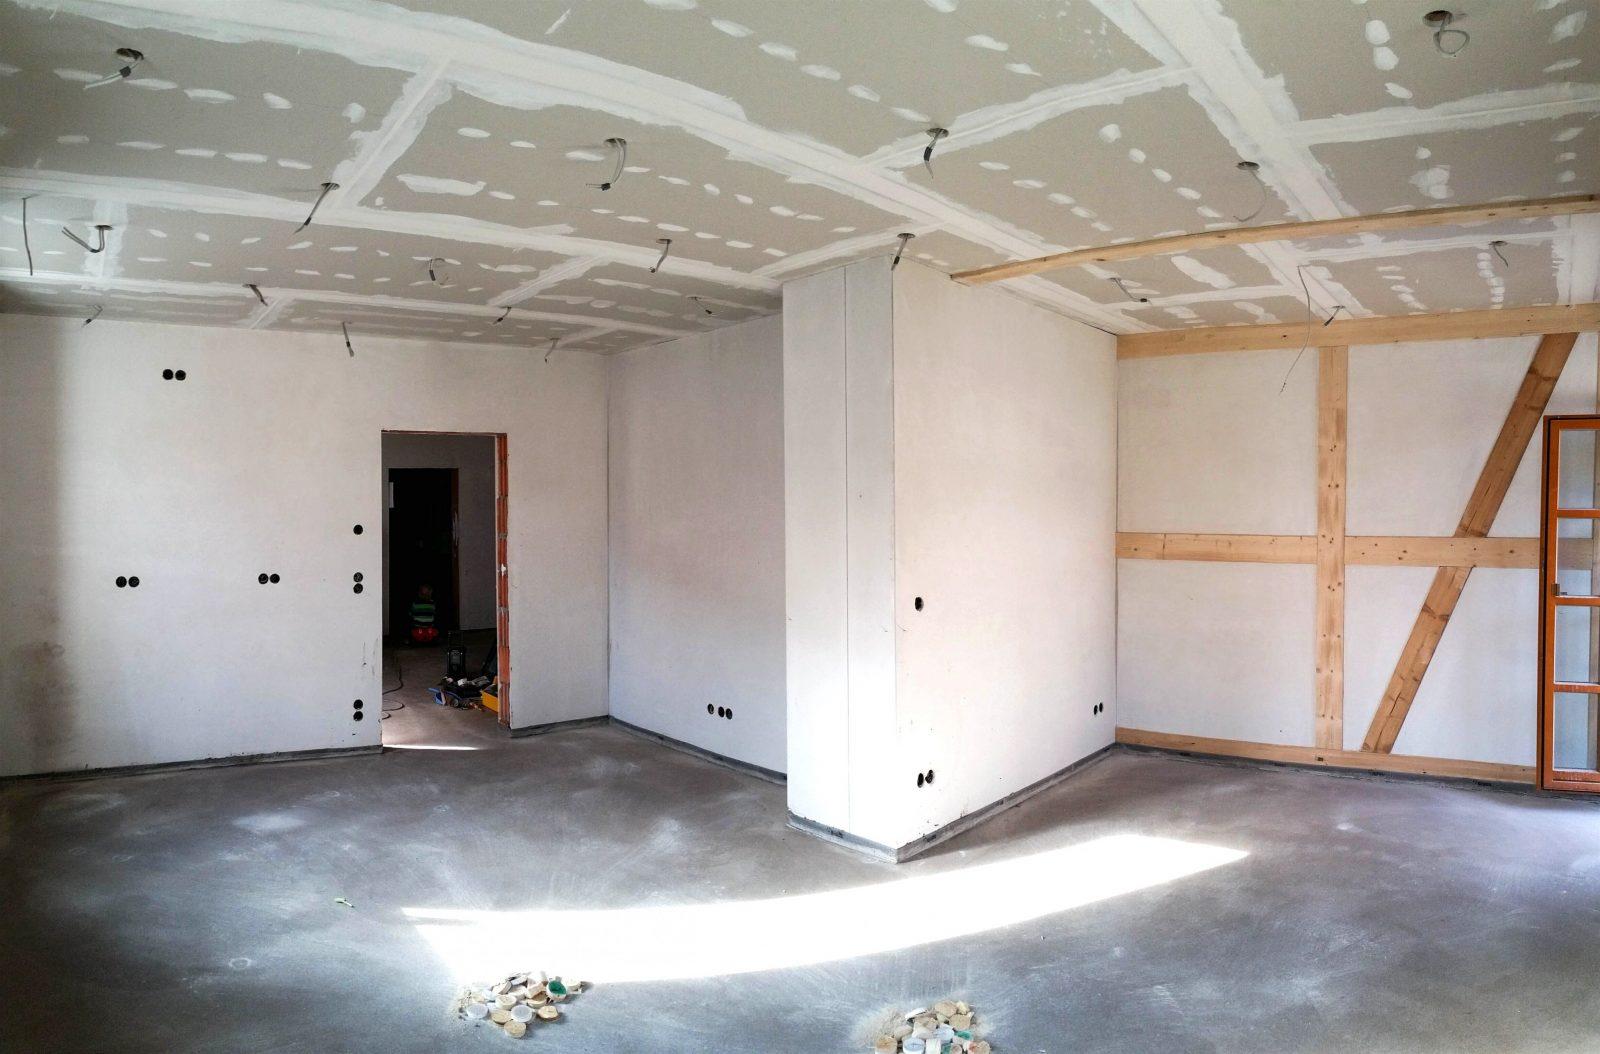 anordnung led spots wohnzimmer haus design ideen. Black Bedroom Furniture Sets. Home Design Ideas